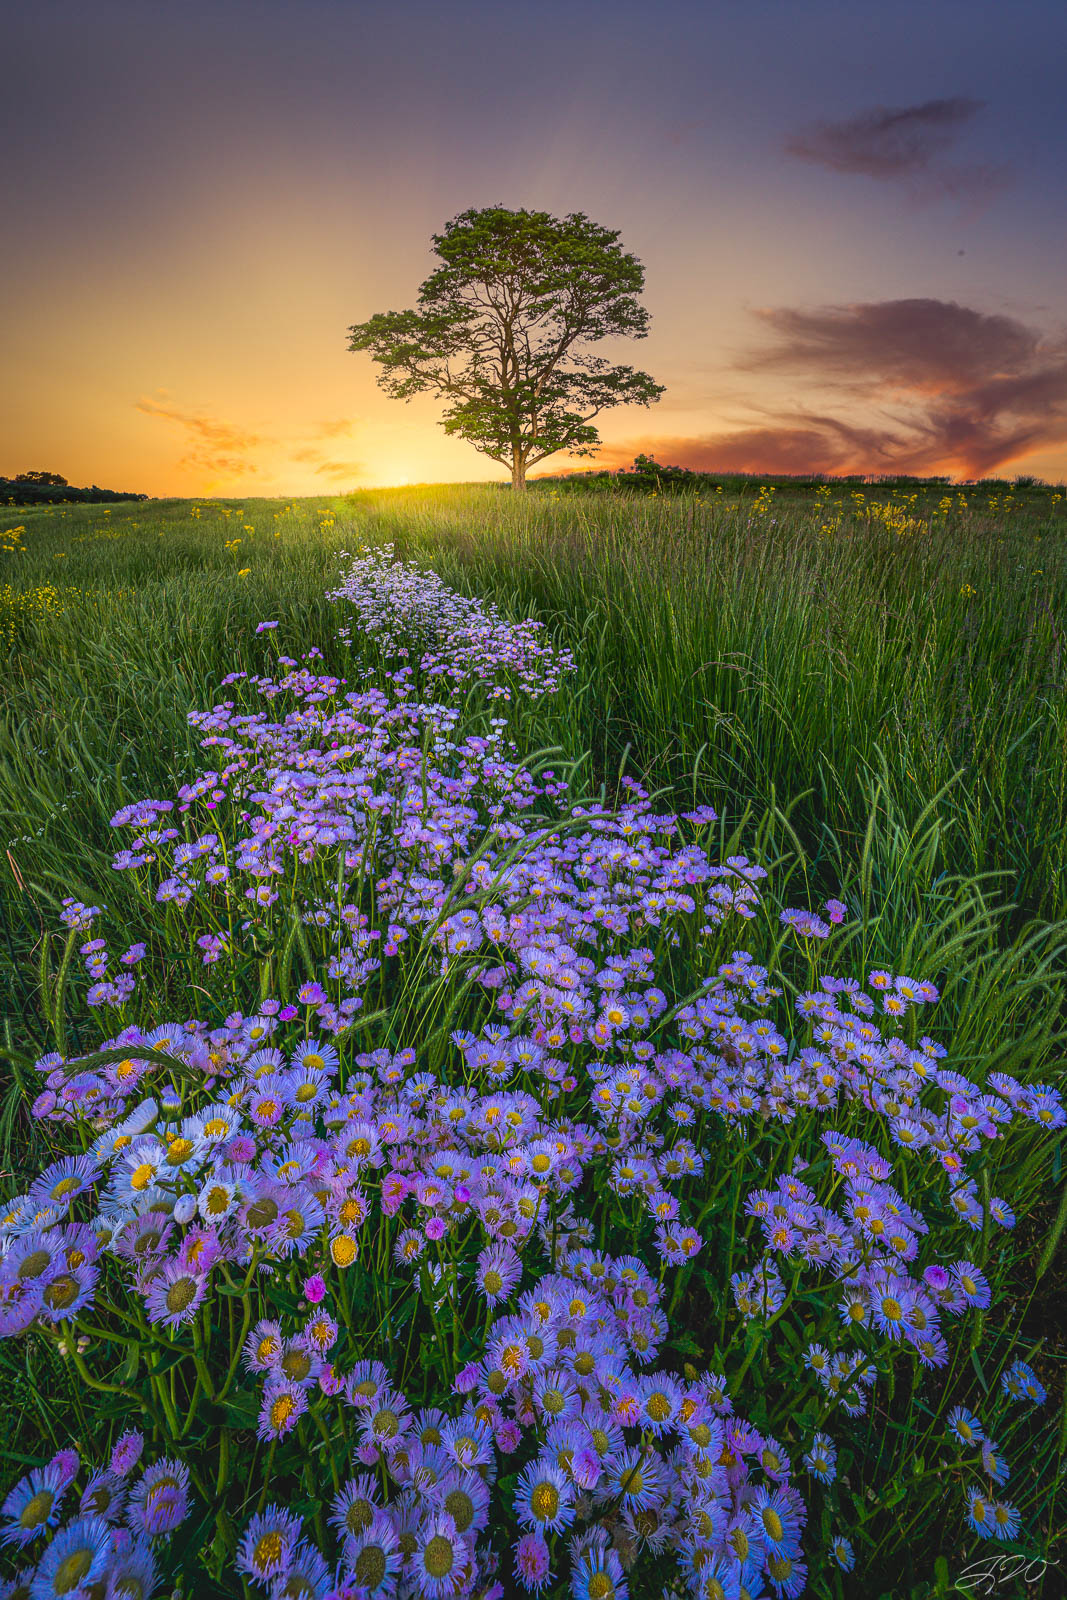 lone, tree, sunset, flowers, wildflowers, asters, daisies, fleabane, photo